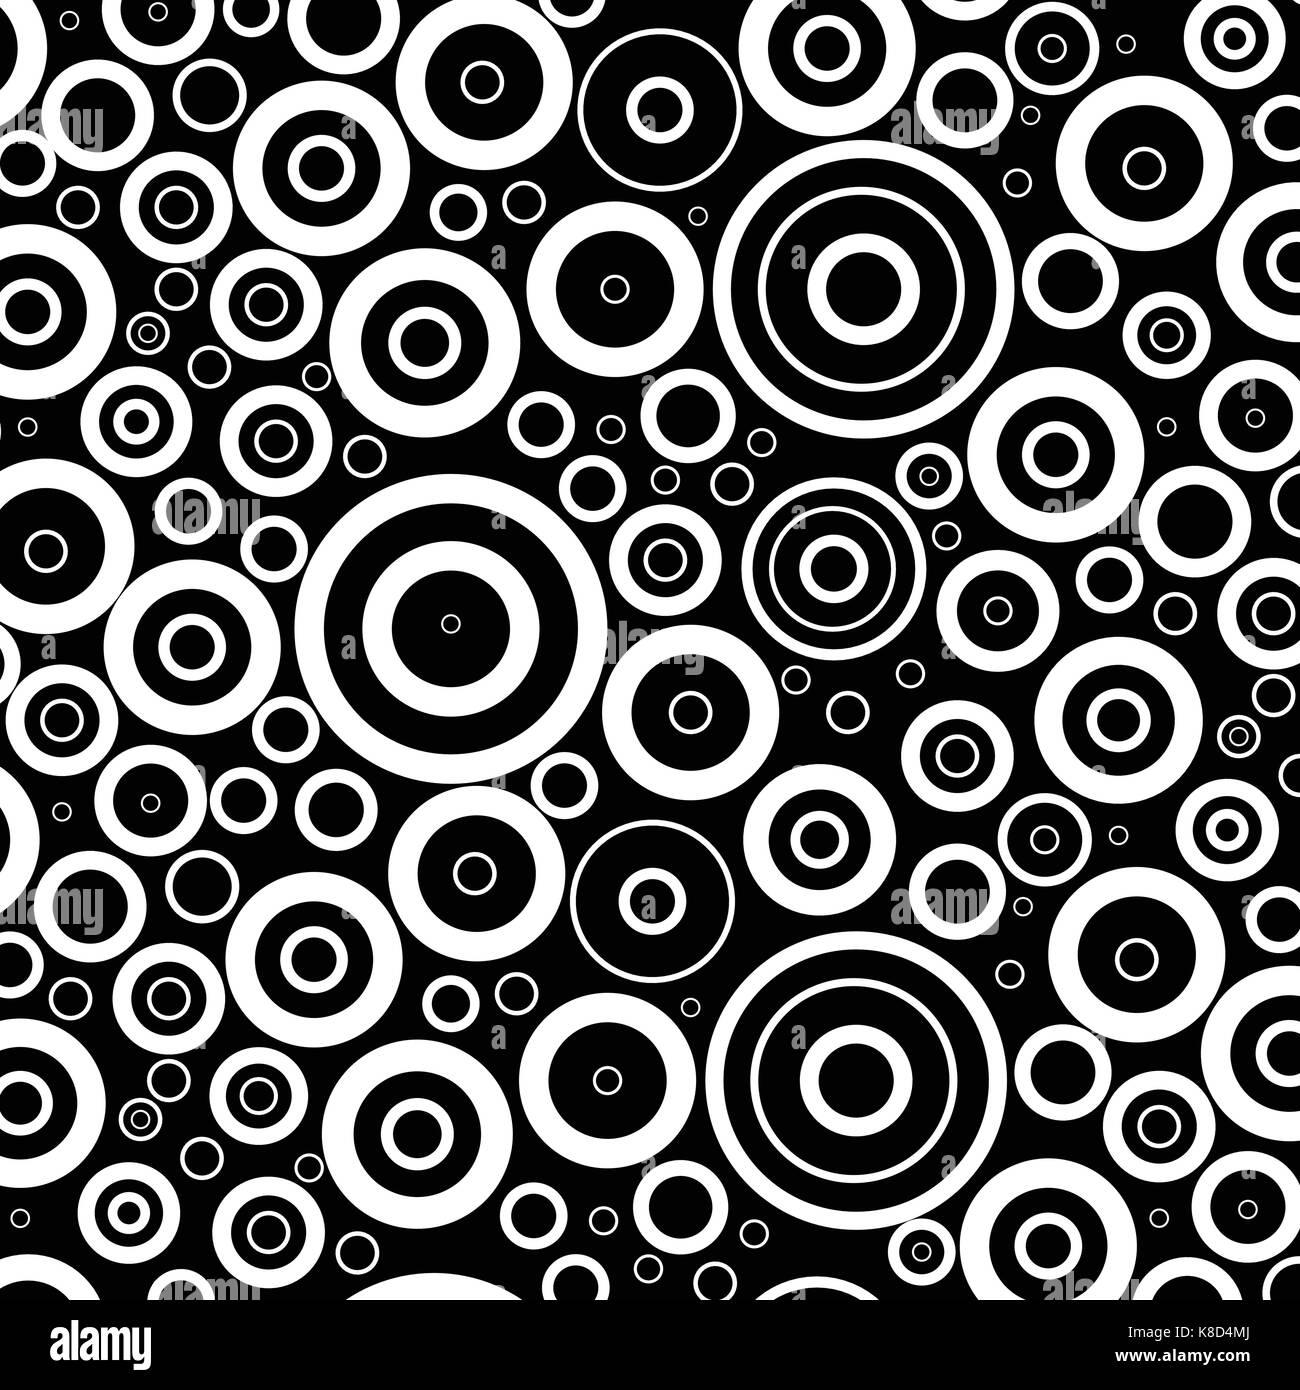 Aboriginal dot art vector background stock image